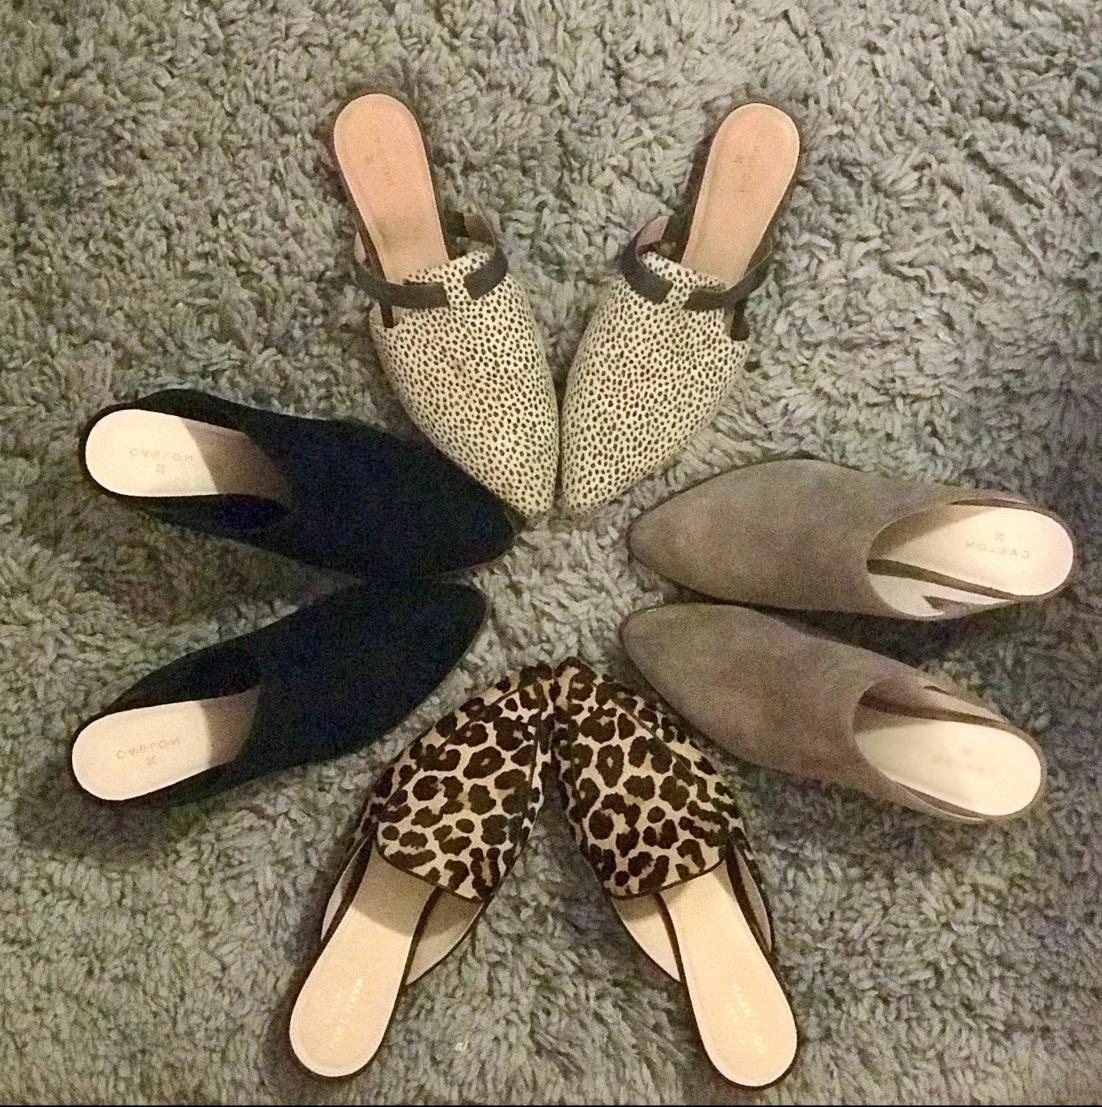 shoe-gasm.jpeg